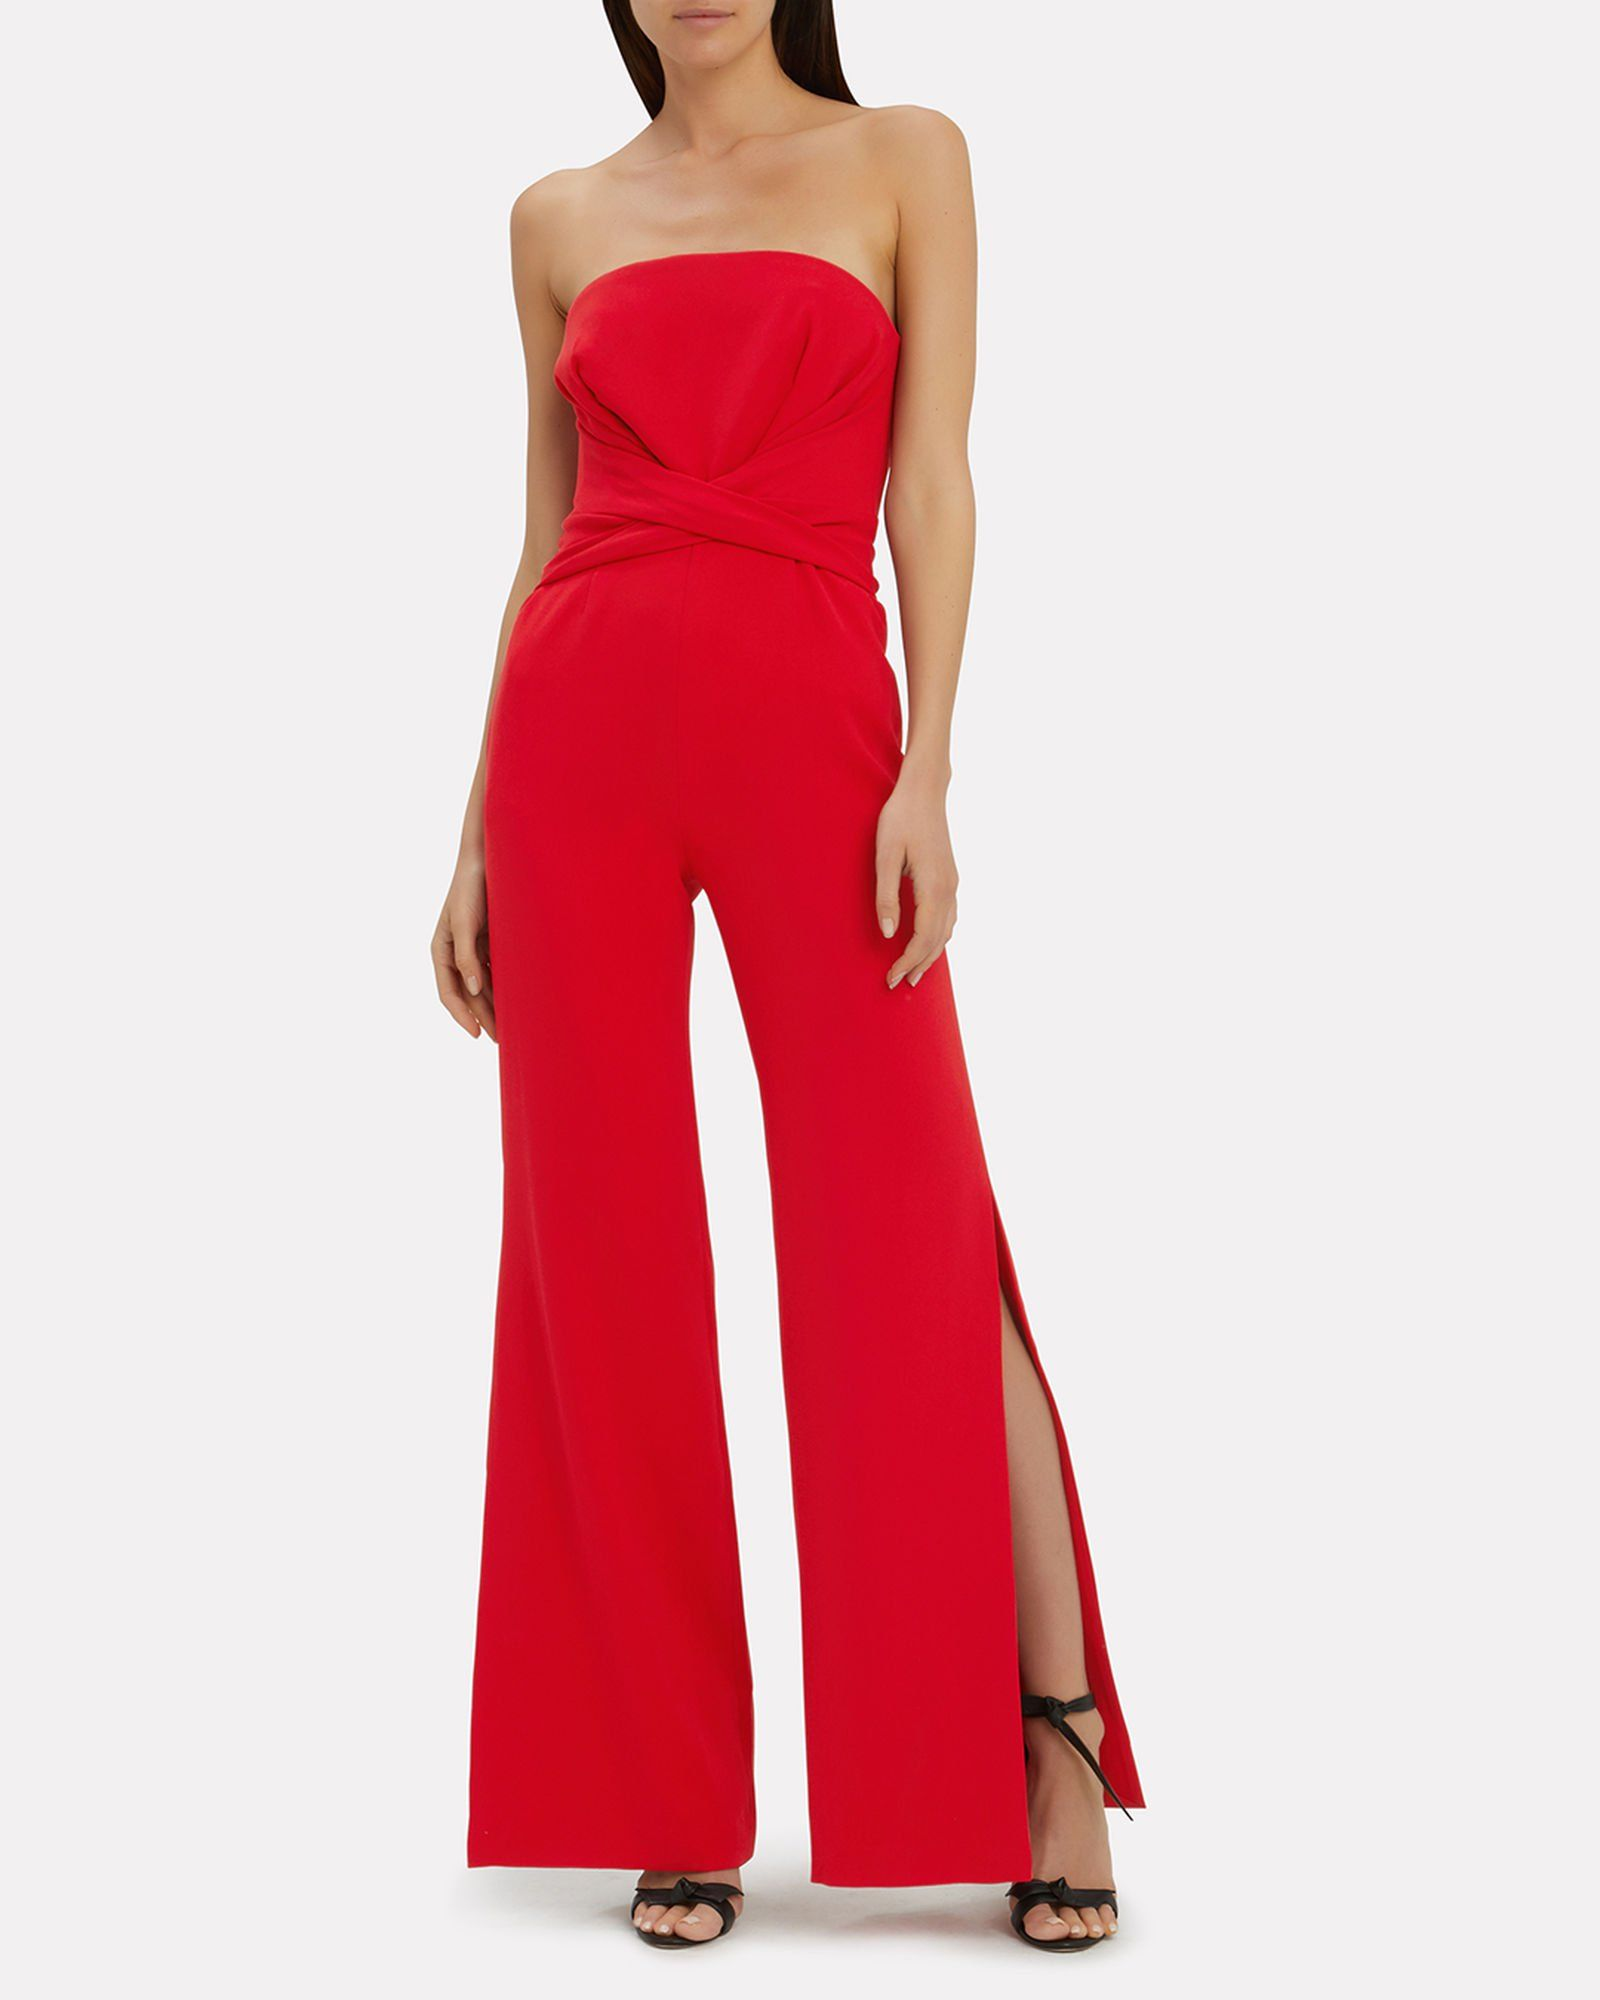 e4a99611738 Red Crepe Jumpsuit